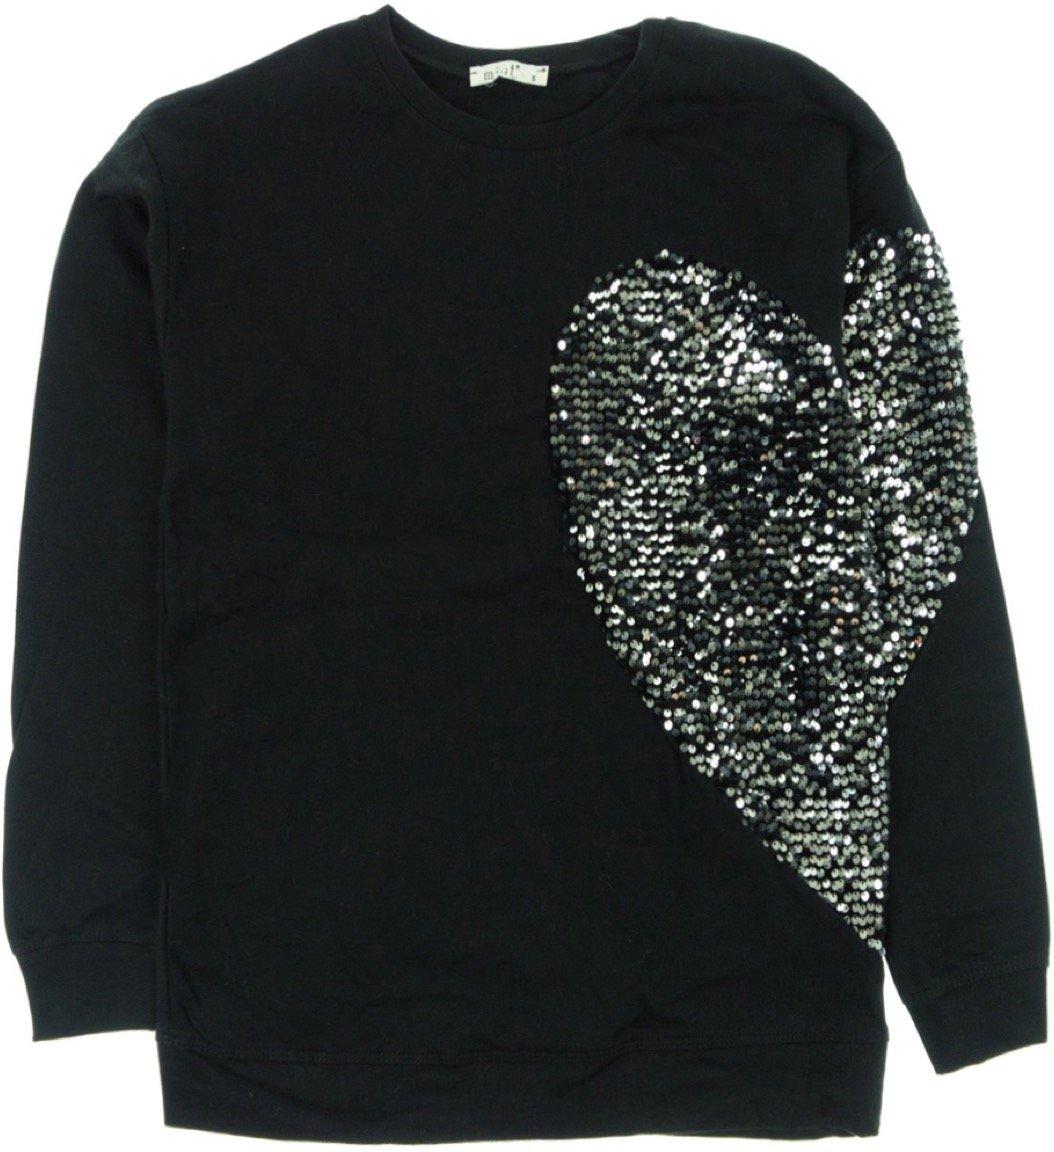 Mint γυναικεία μπλούζα «Black Heart»